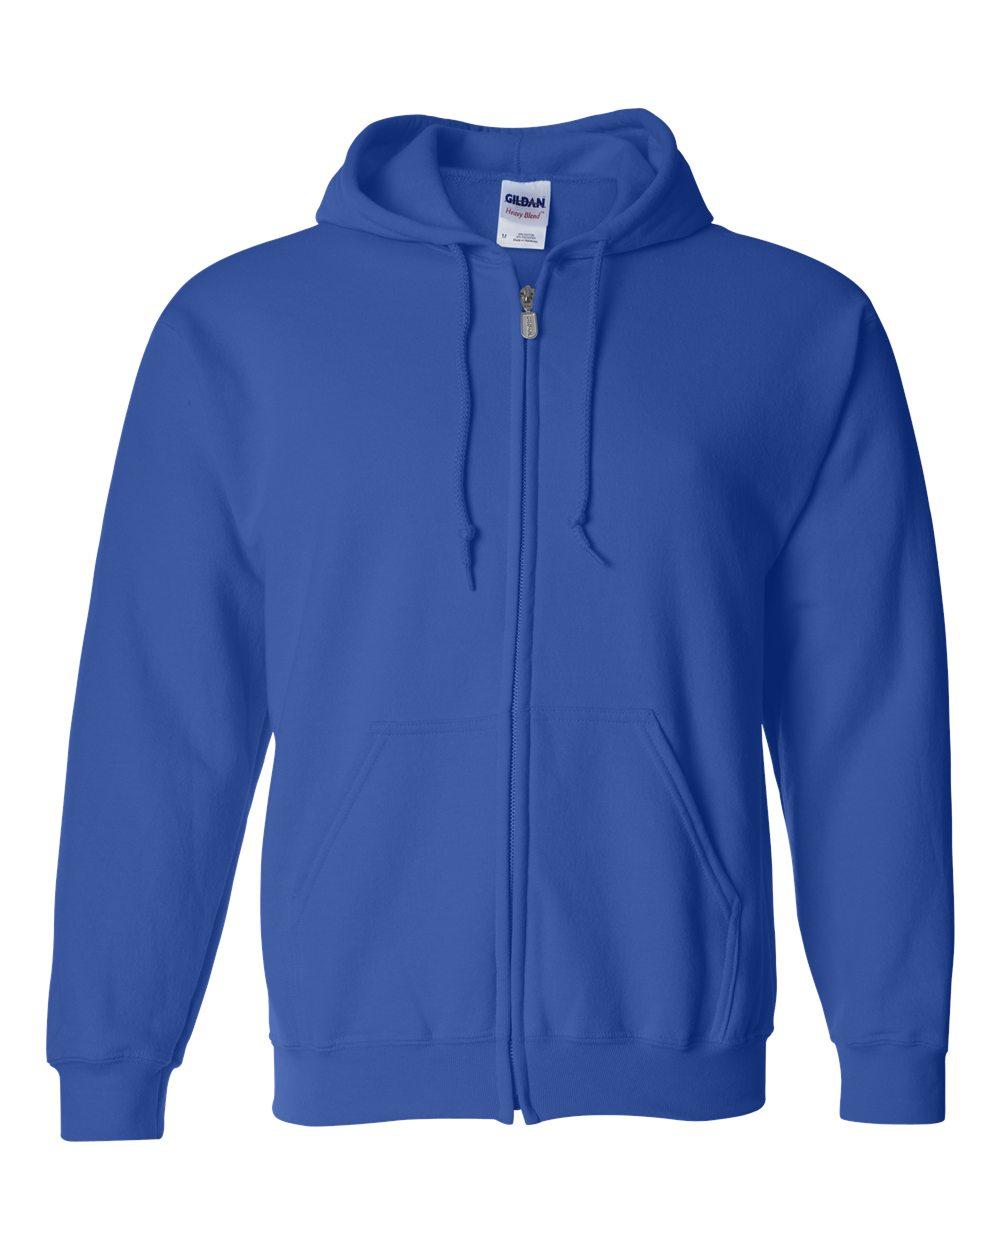 4f0620541182 Μπλούζες Φούτερ GILDAN 270gr με κουκούλα και φερμουάρ